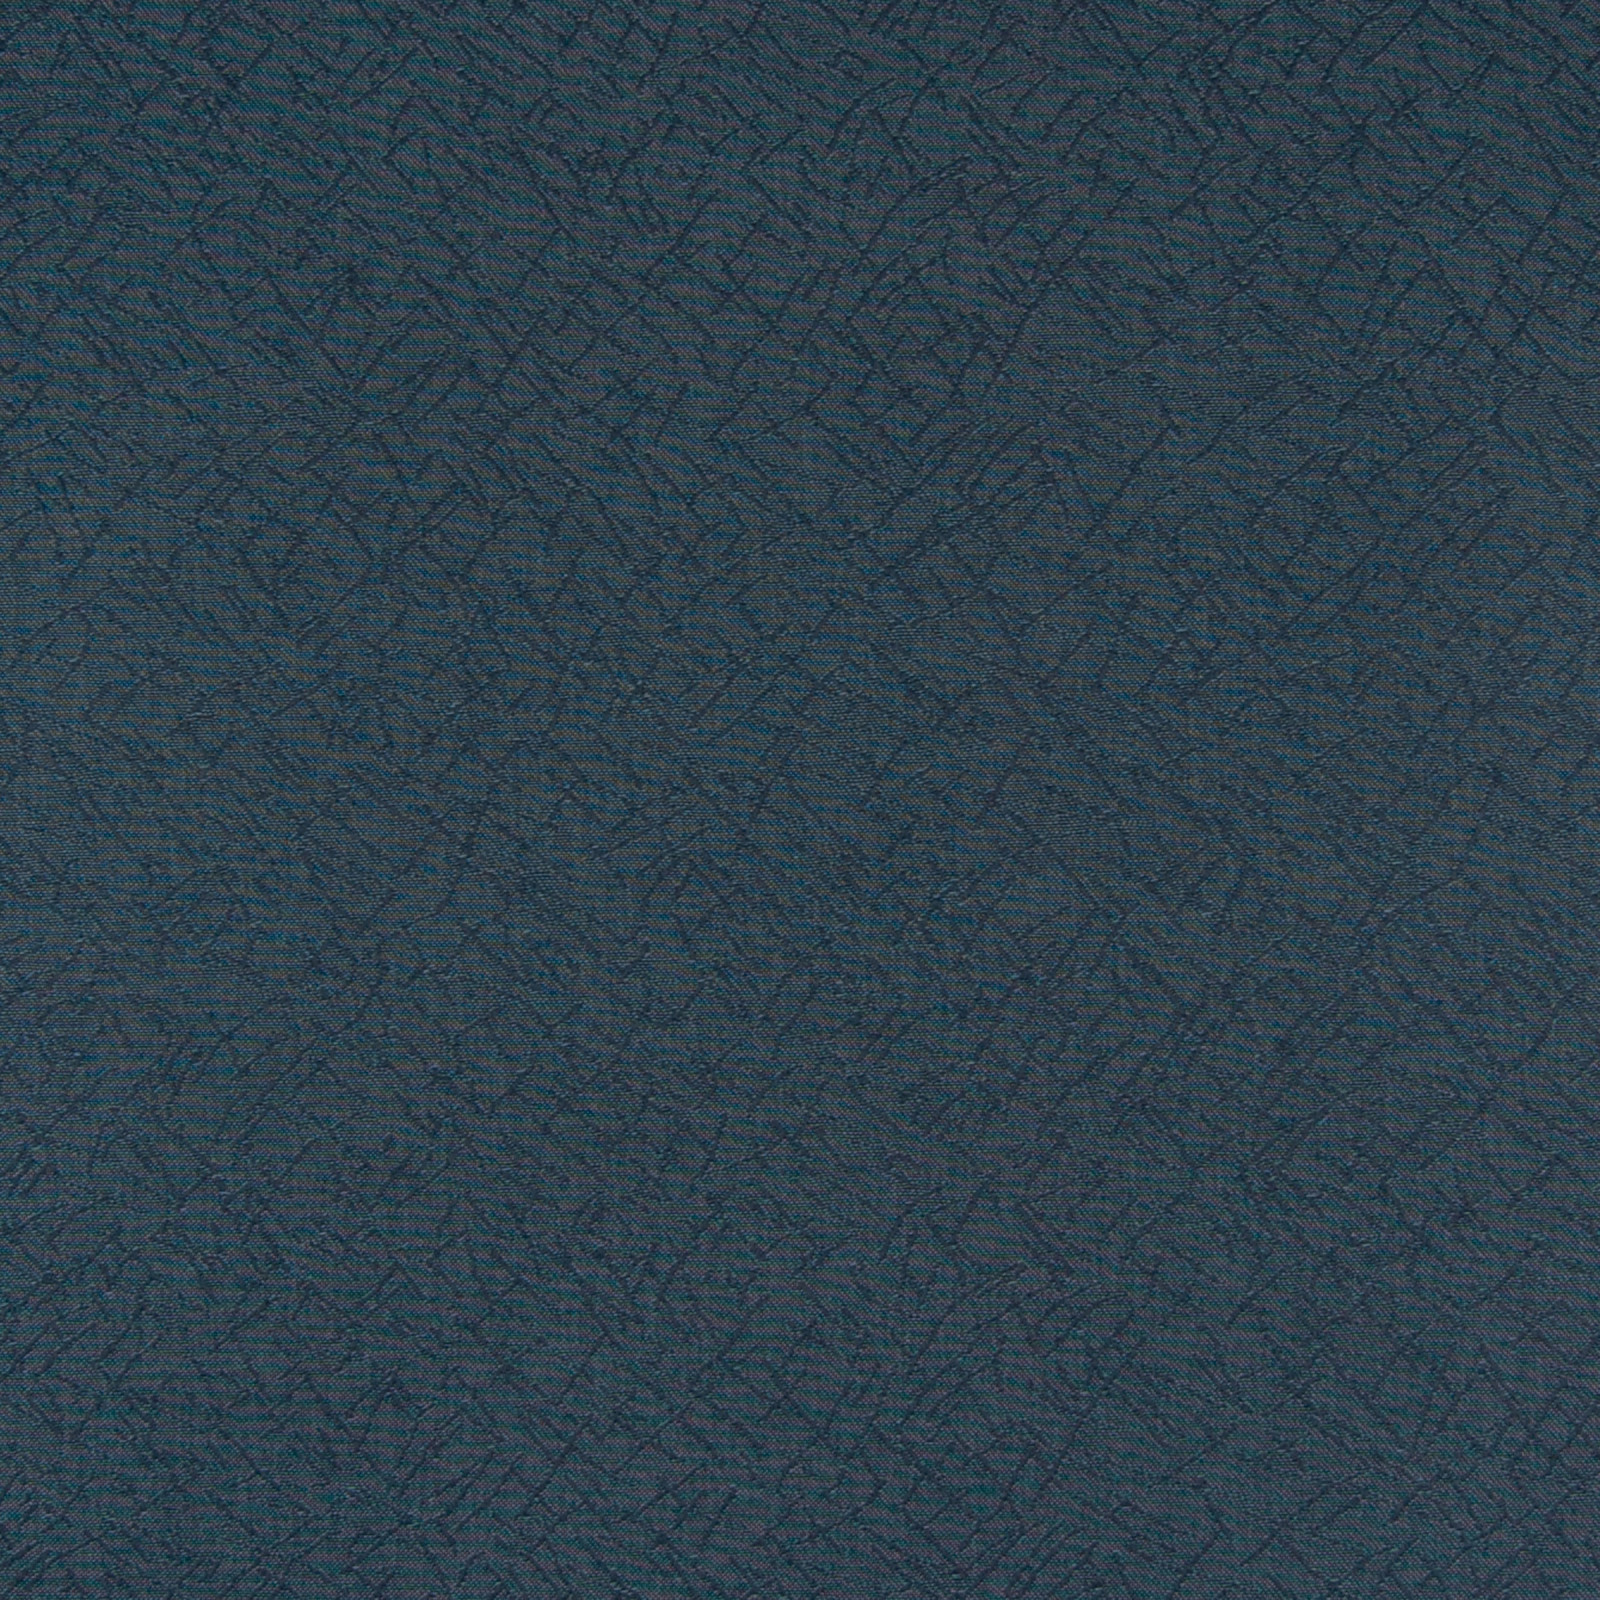 B5371 Blue Jay Greenhouse Fabrics